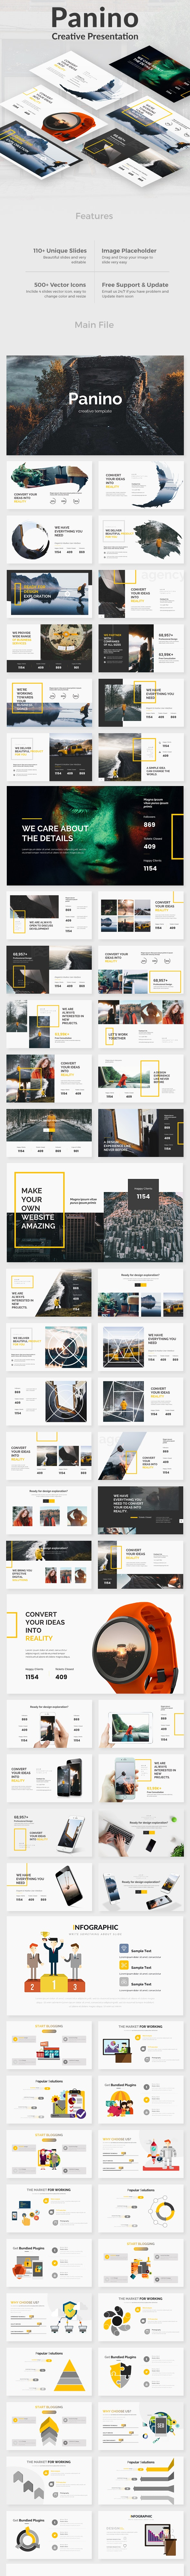 Panino Creative Design Keynote Template - Creative Keynote Templates